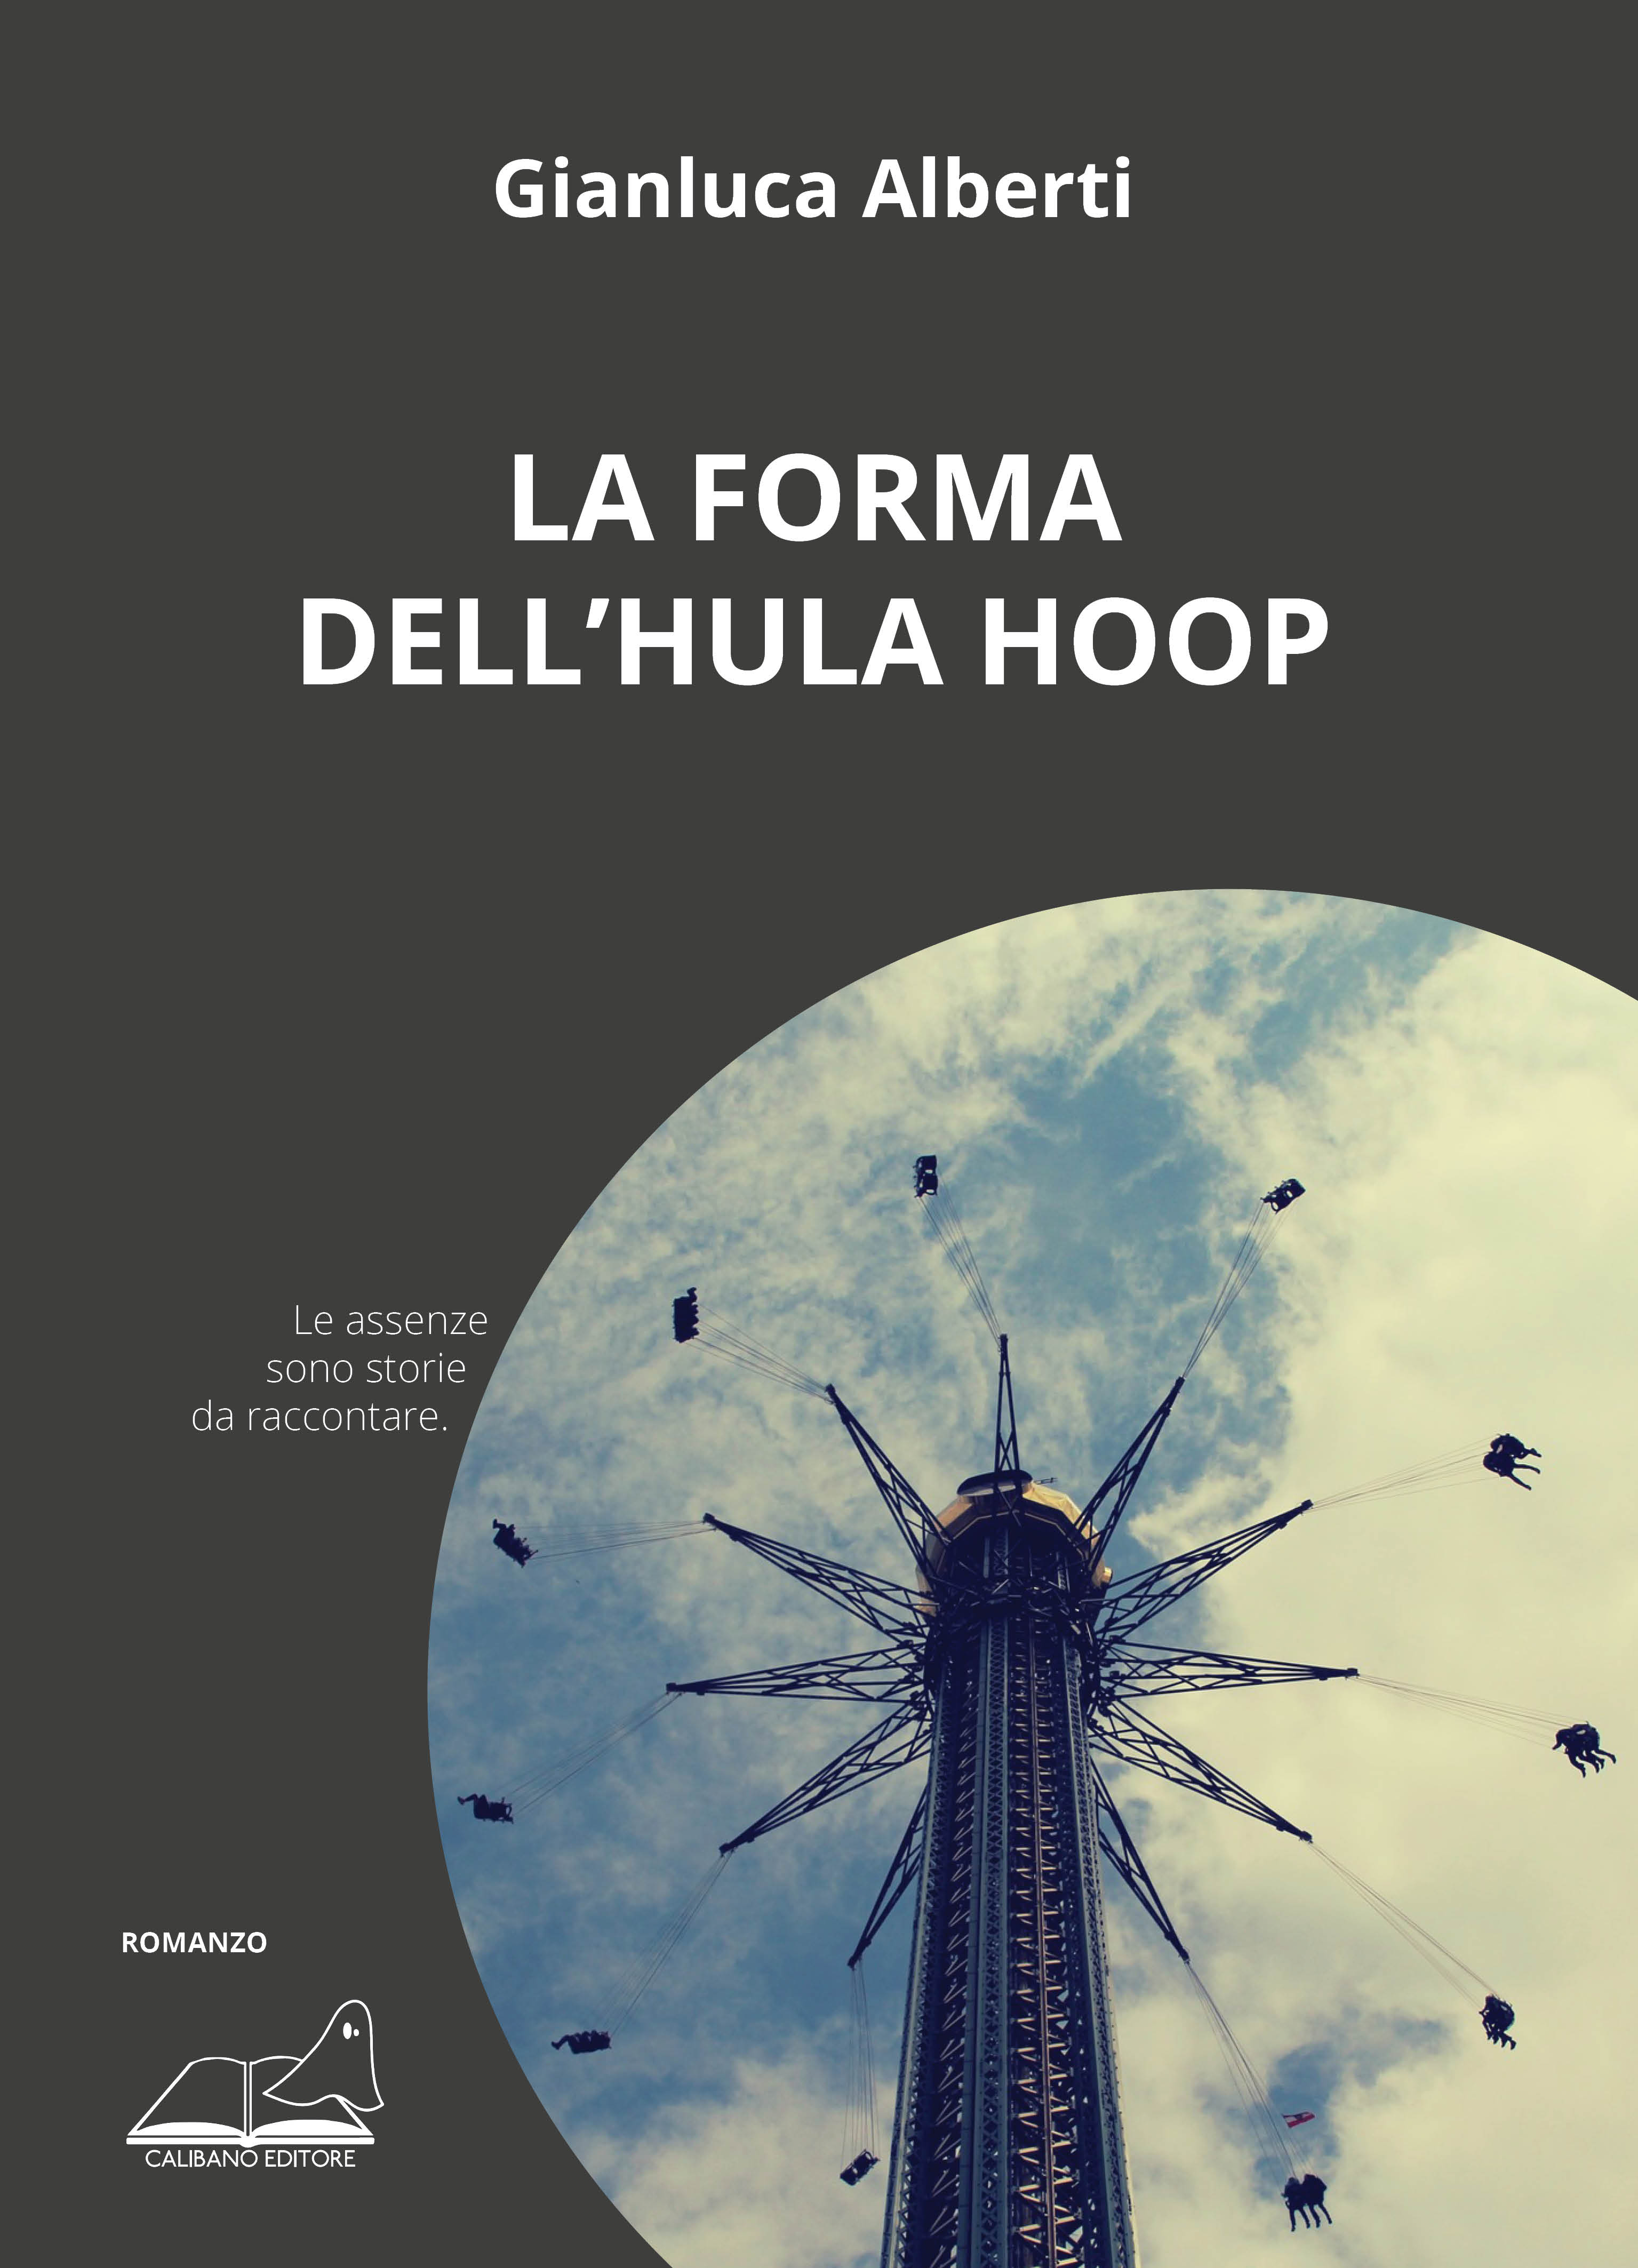 La forma dell'hula hoop-image-1%>